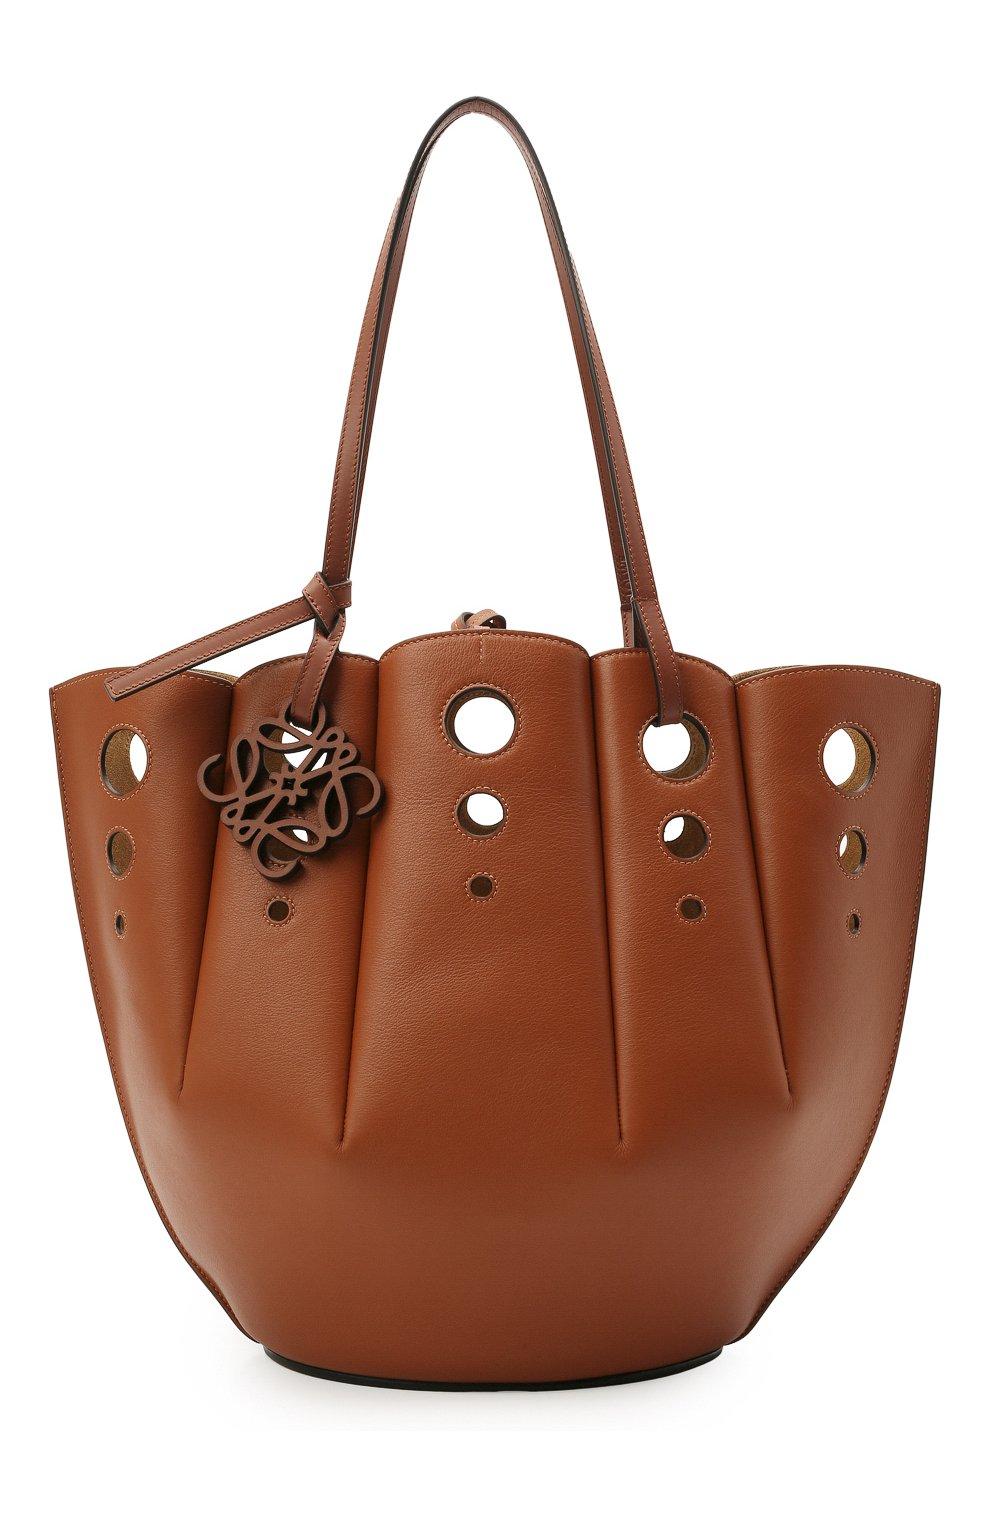 Женский сумка-тоут shell LOEWE коричневого цвета, арт. A657R52X13 | Фото 1 (Сумки-технические: Сумки-шопперы; Ошибки технического описания: Нет ширины; Размер: medium; Материал: Натуральная кожа)